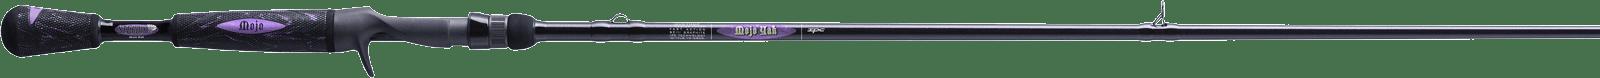 St. Croix – Mojo Yak Casting – 7'6″ MHF | Florida Fishing